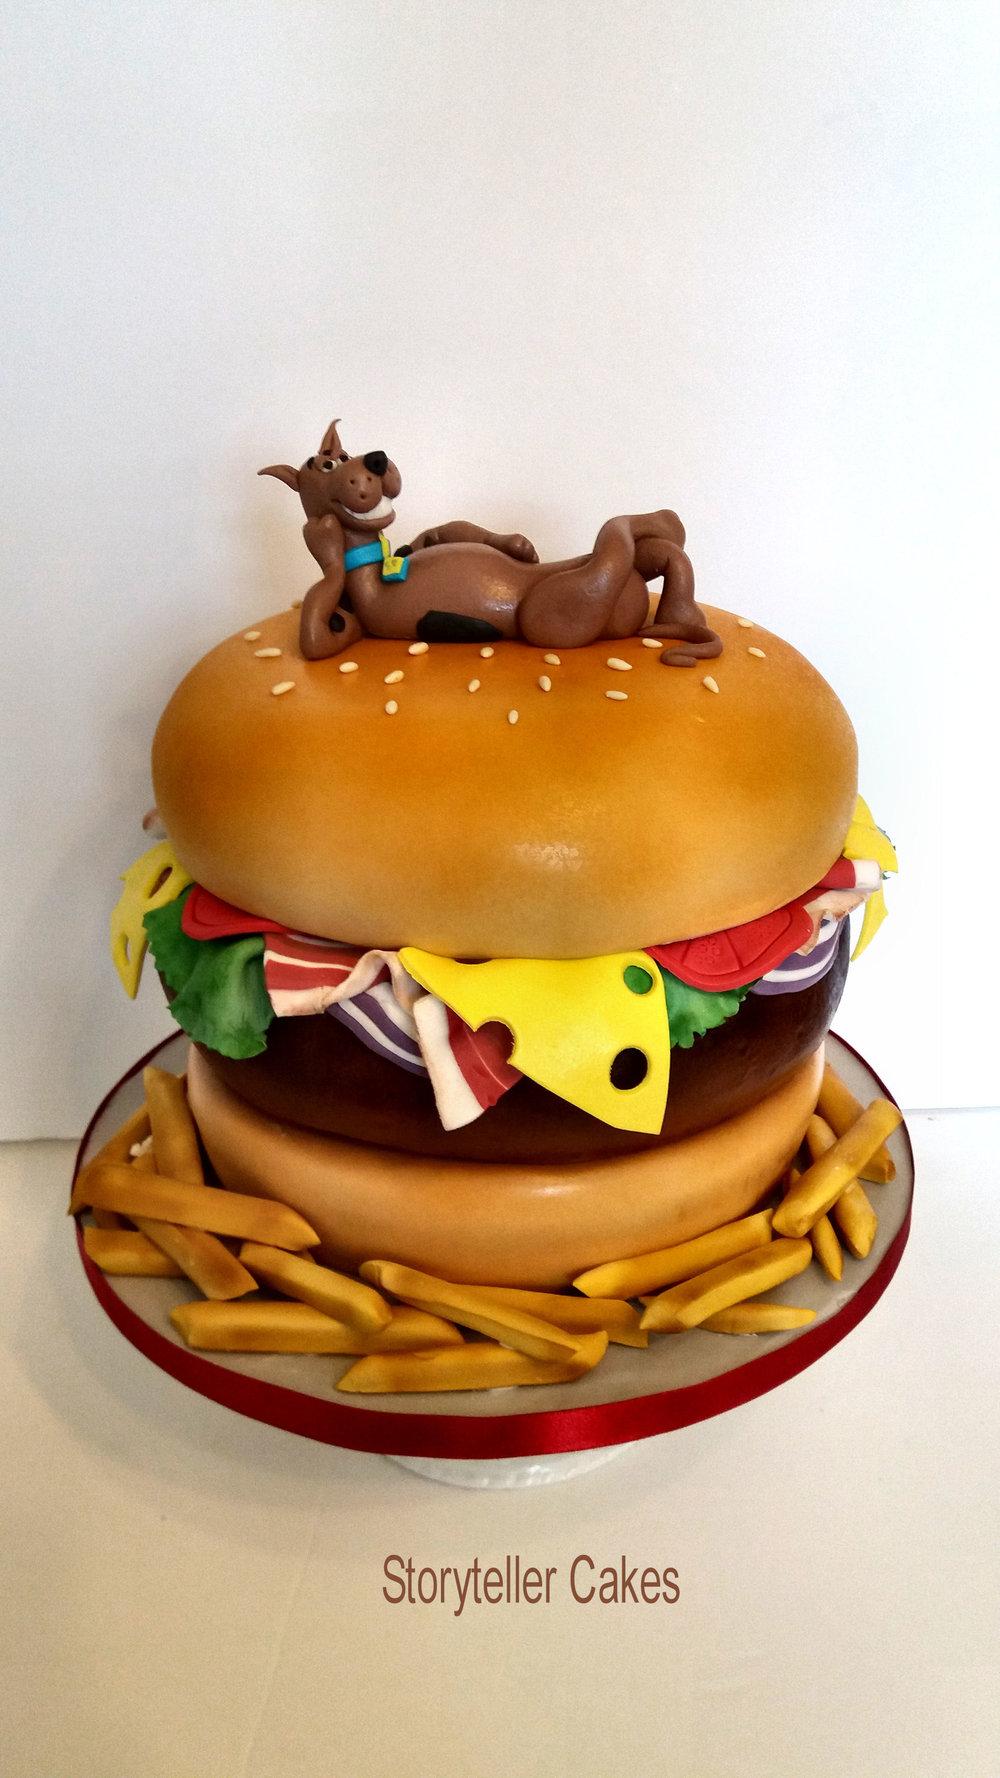 Scooby Doo Burger Cake1.jpg